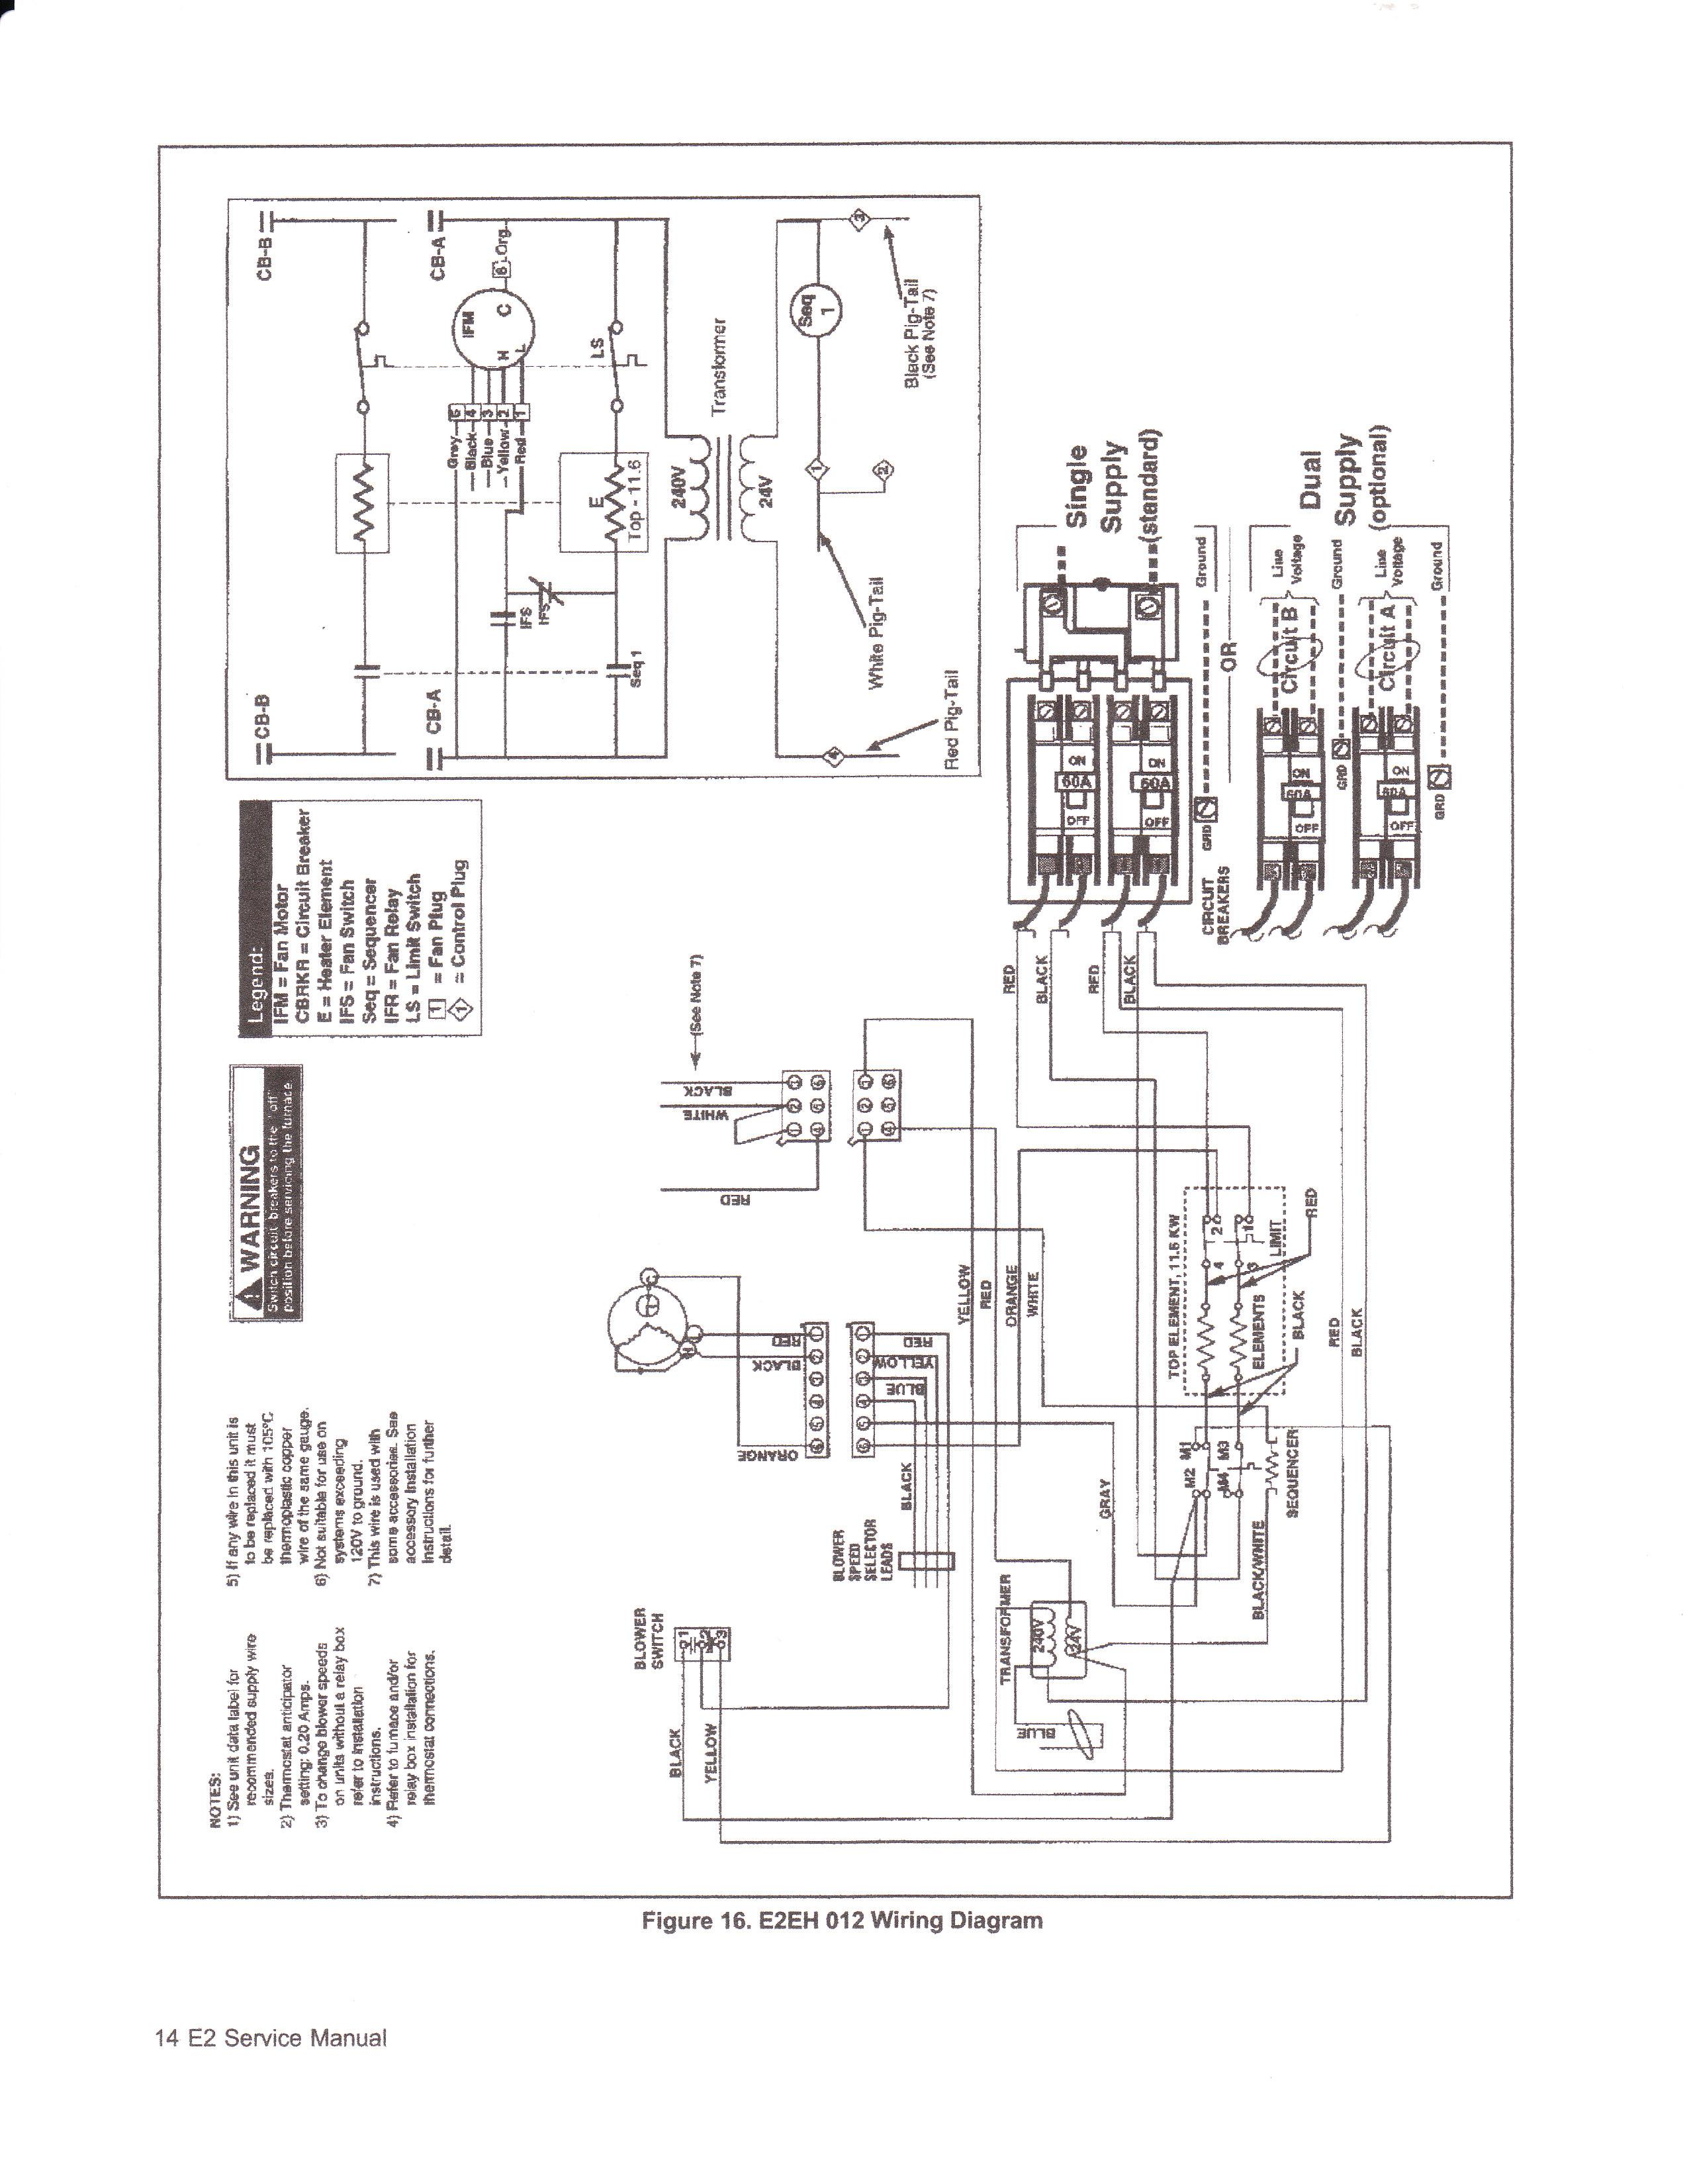 Wiring Diagram For Intertherm Furnace - E5 wiring diagramKUBB-AUF.DE